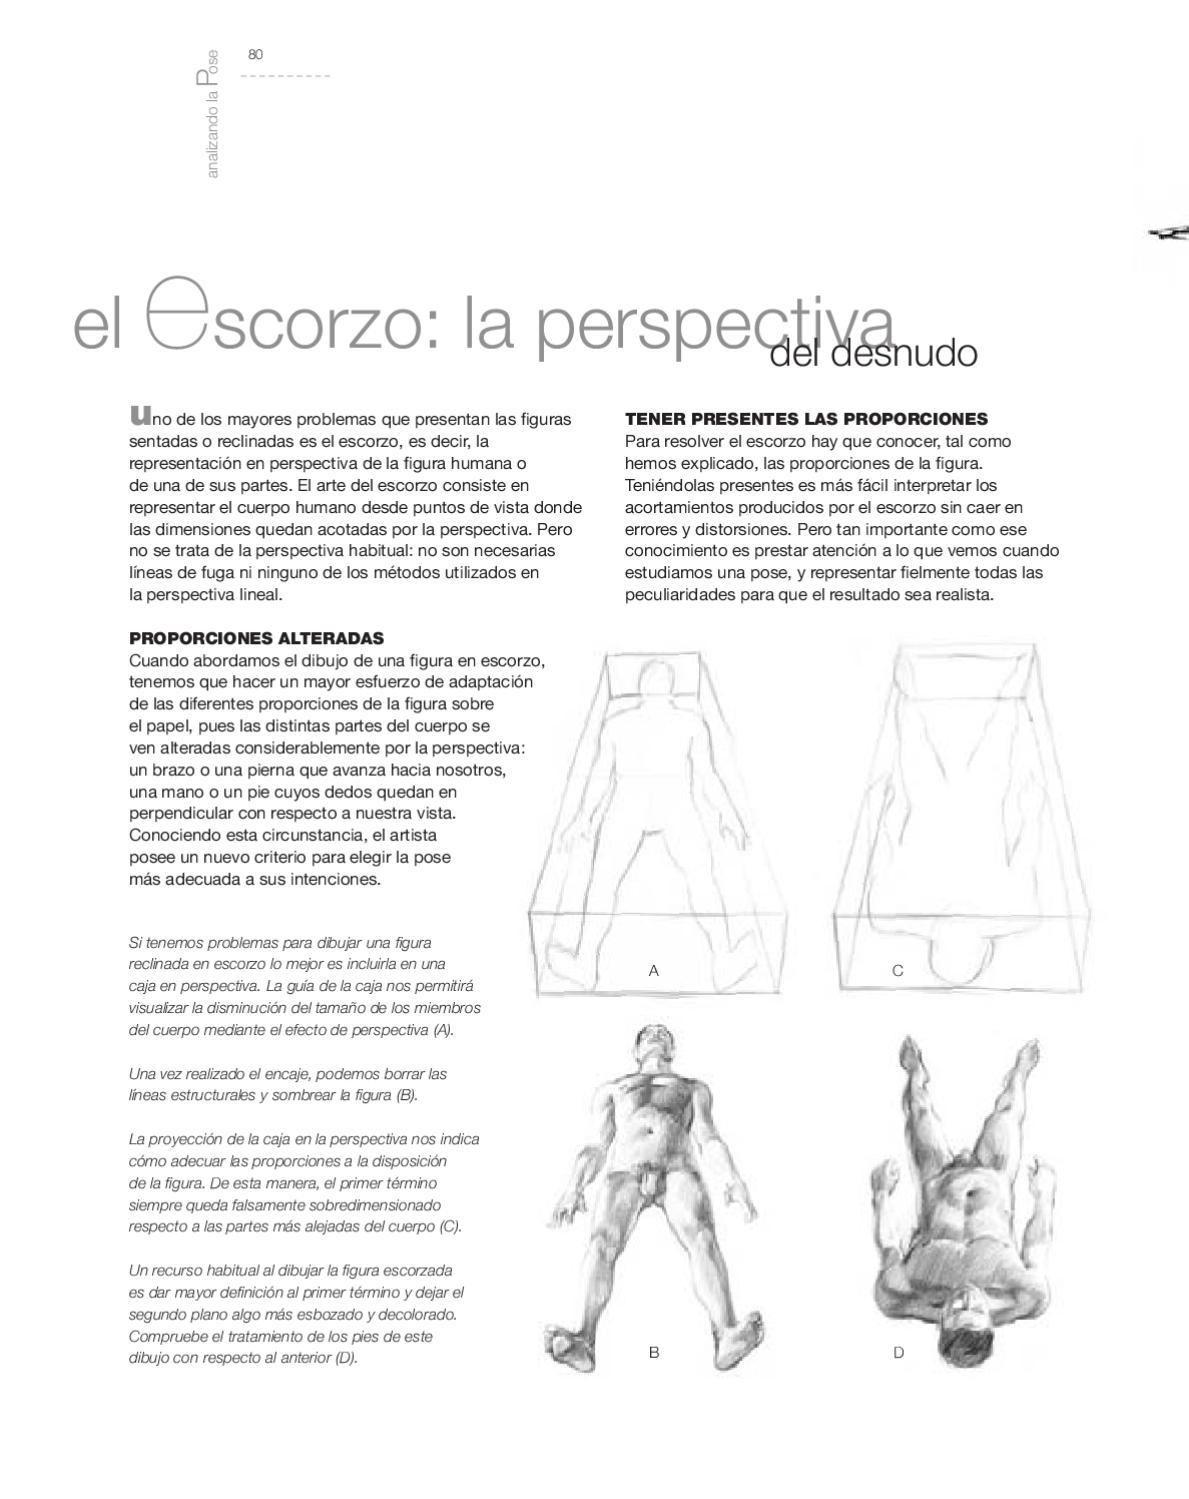 Aula de dibujo  Dibujo de la figura humana  Newspaper